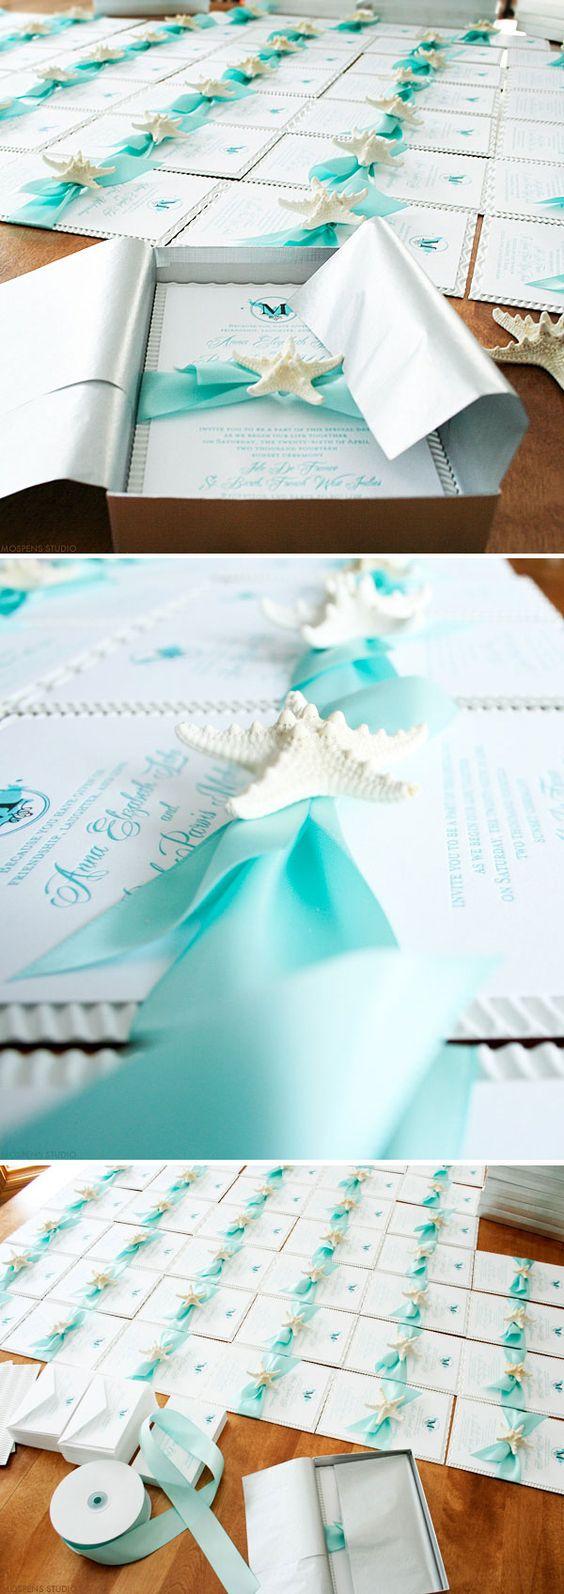 Beautiful Beach Wedding Invitations - The sea-worthy design features original art, ribbon, starfish, tissue paper, and invitation box. Completely customizable! Available online www.mospensstudio.com